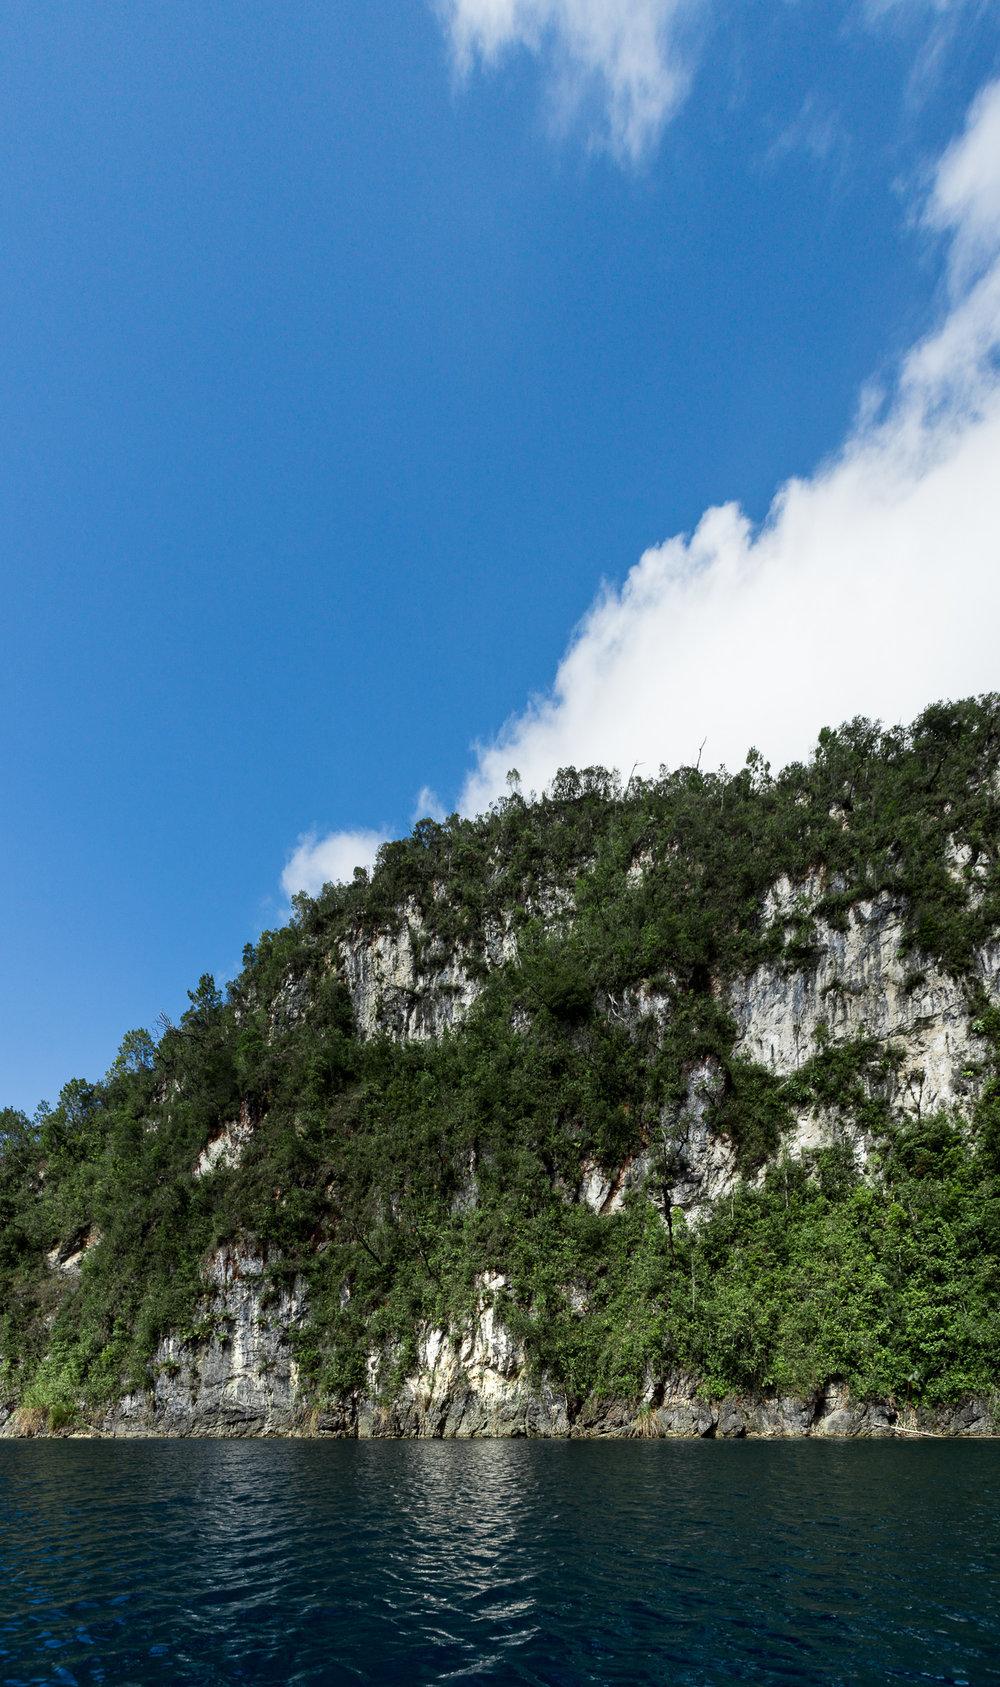 2017 - ChiapasTrip_D3_66612017-Pano - 148.jpg